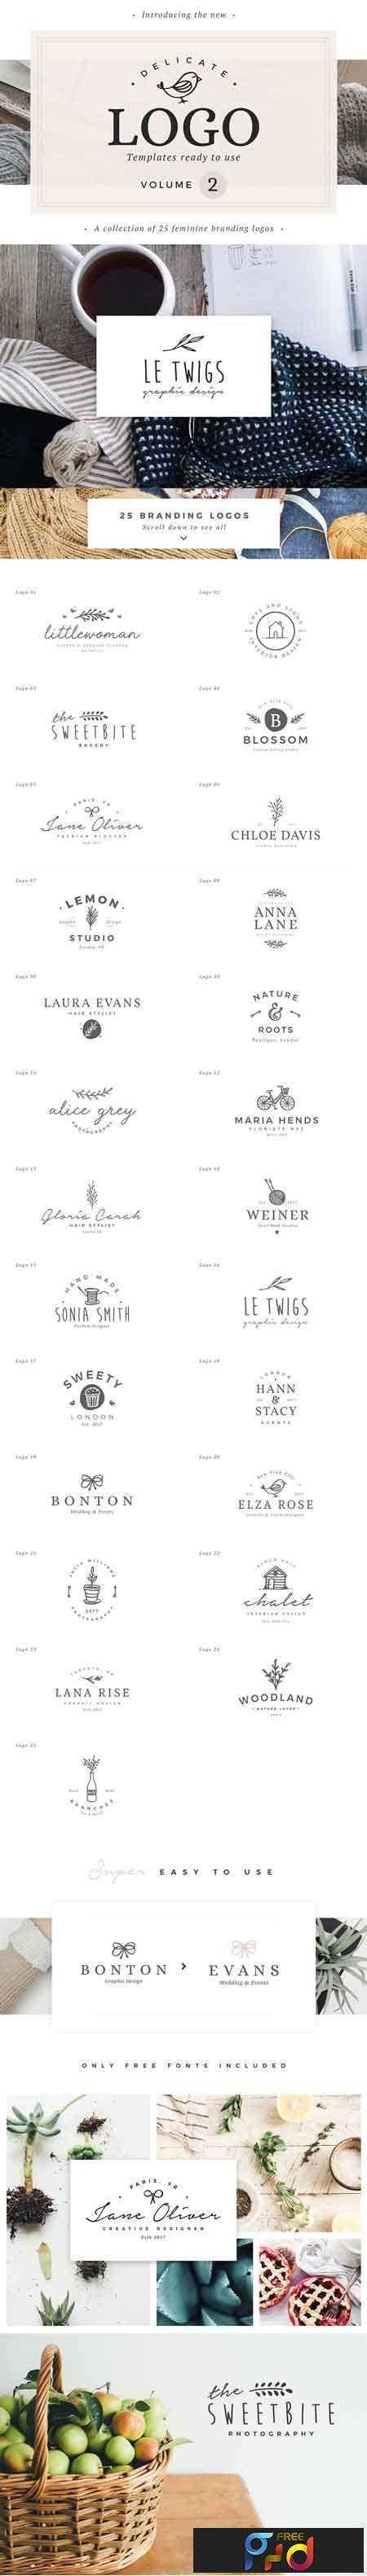 1803022 25 Delicate Feminine Logos - Vol 2 2118779 1